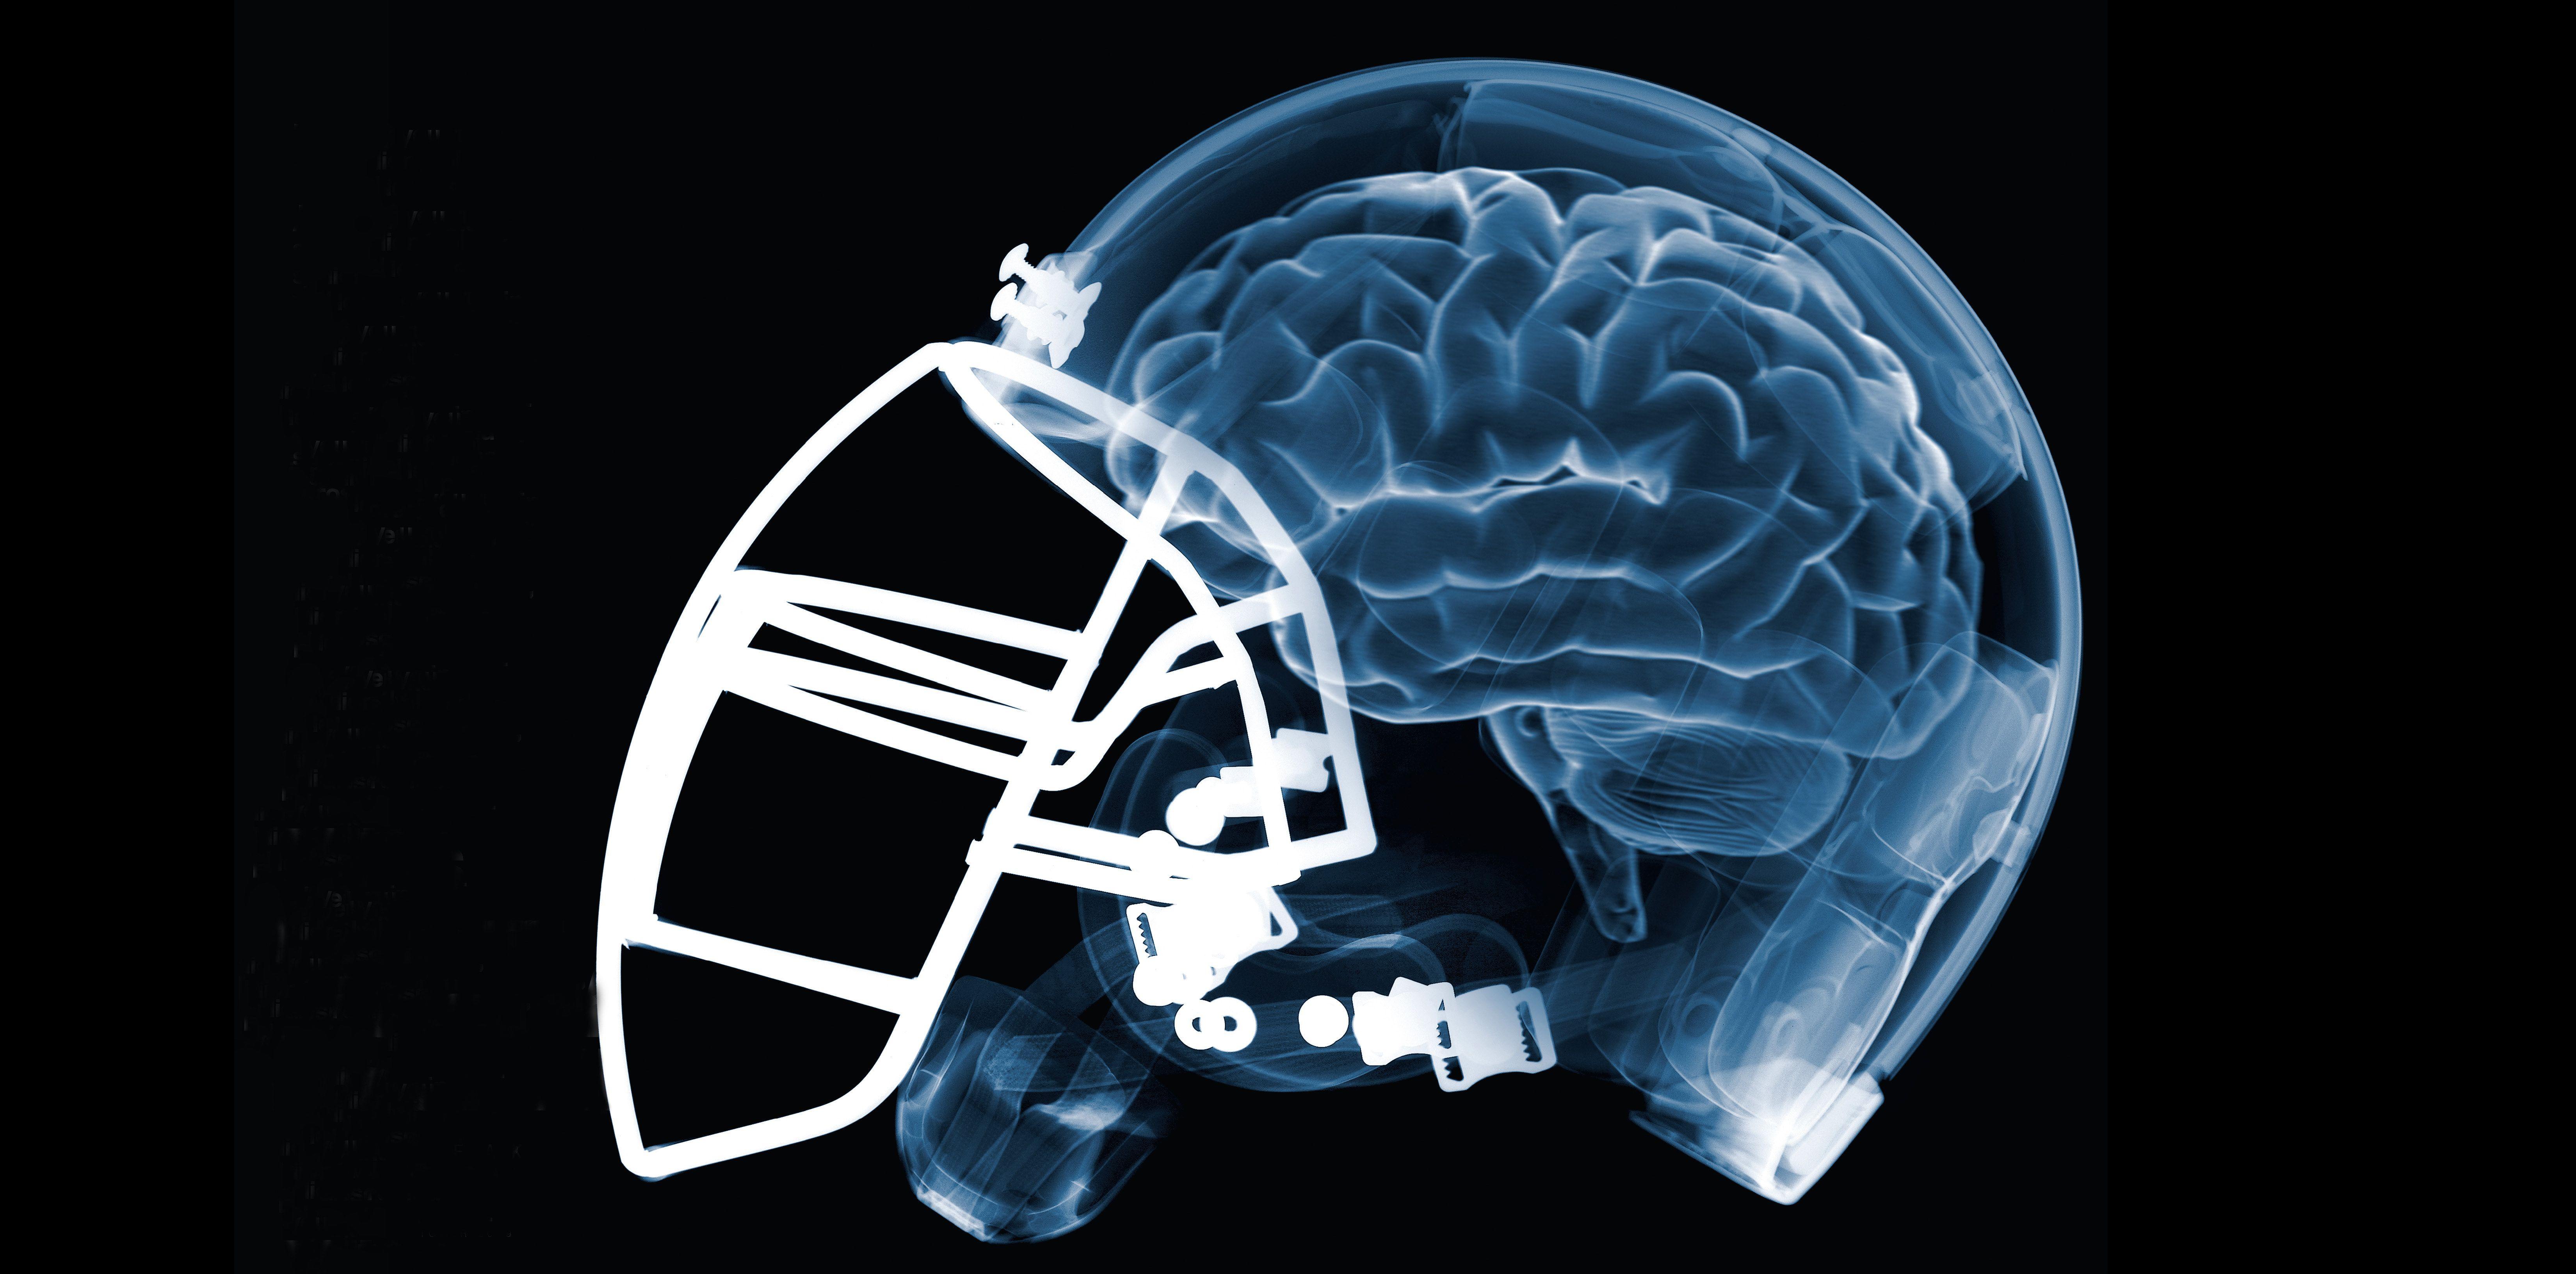 Football Injuries Chronic Traumatic Encephalopathy Cte